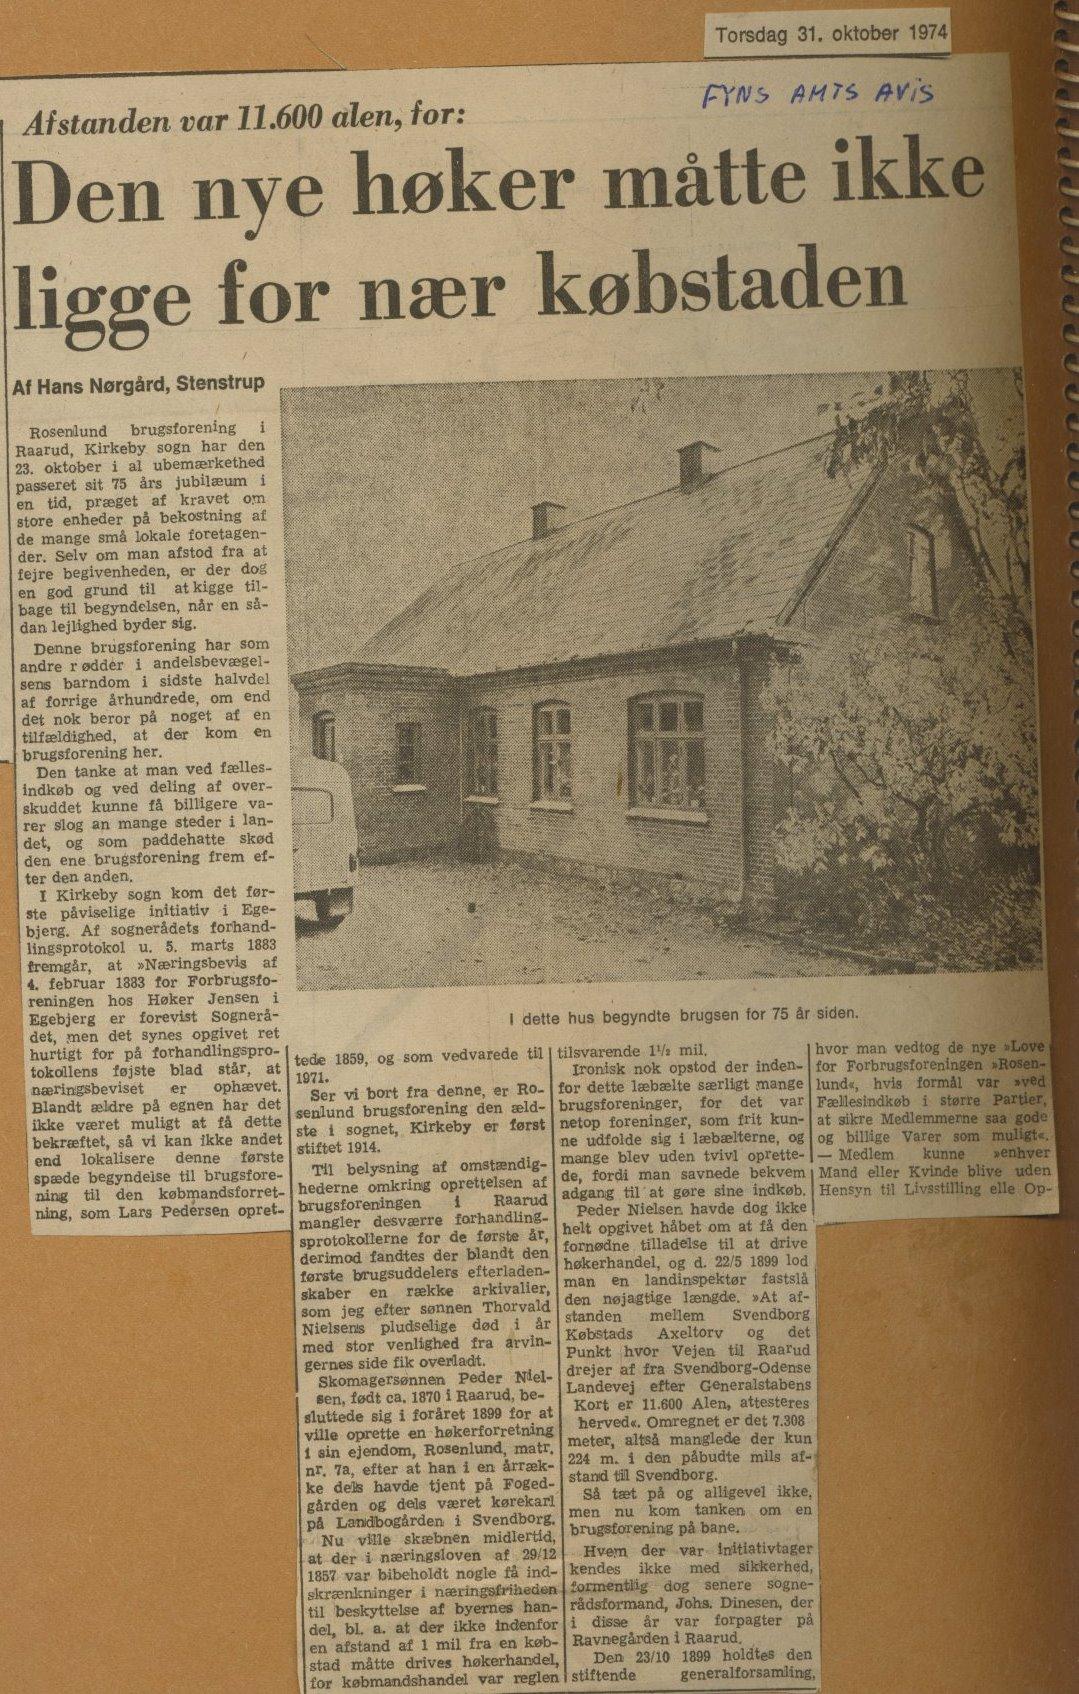 Rosenlund Brugsforening